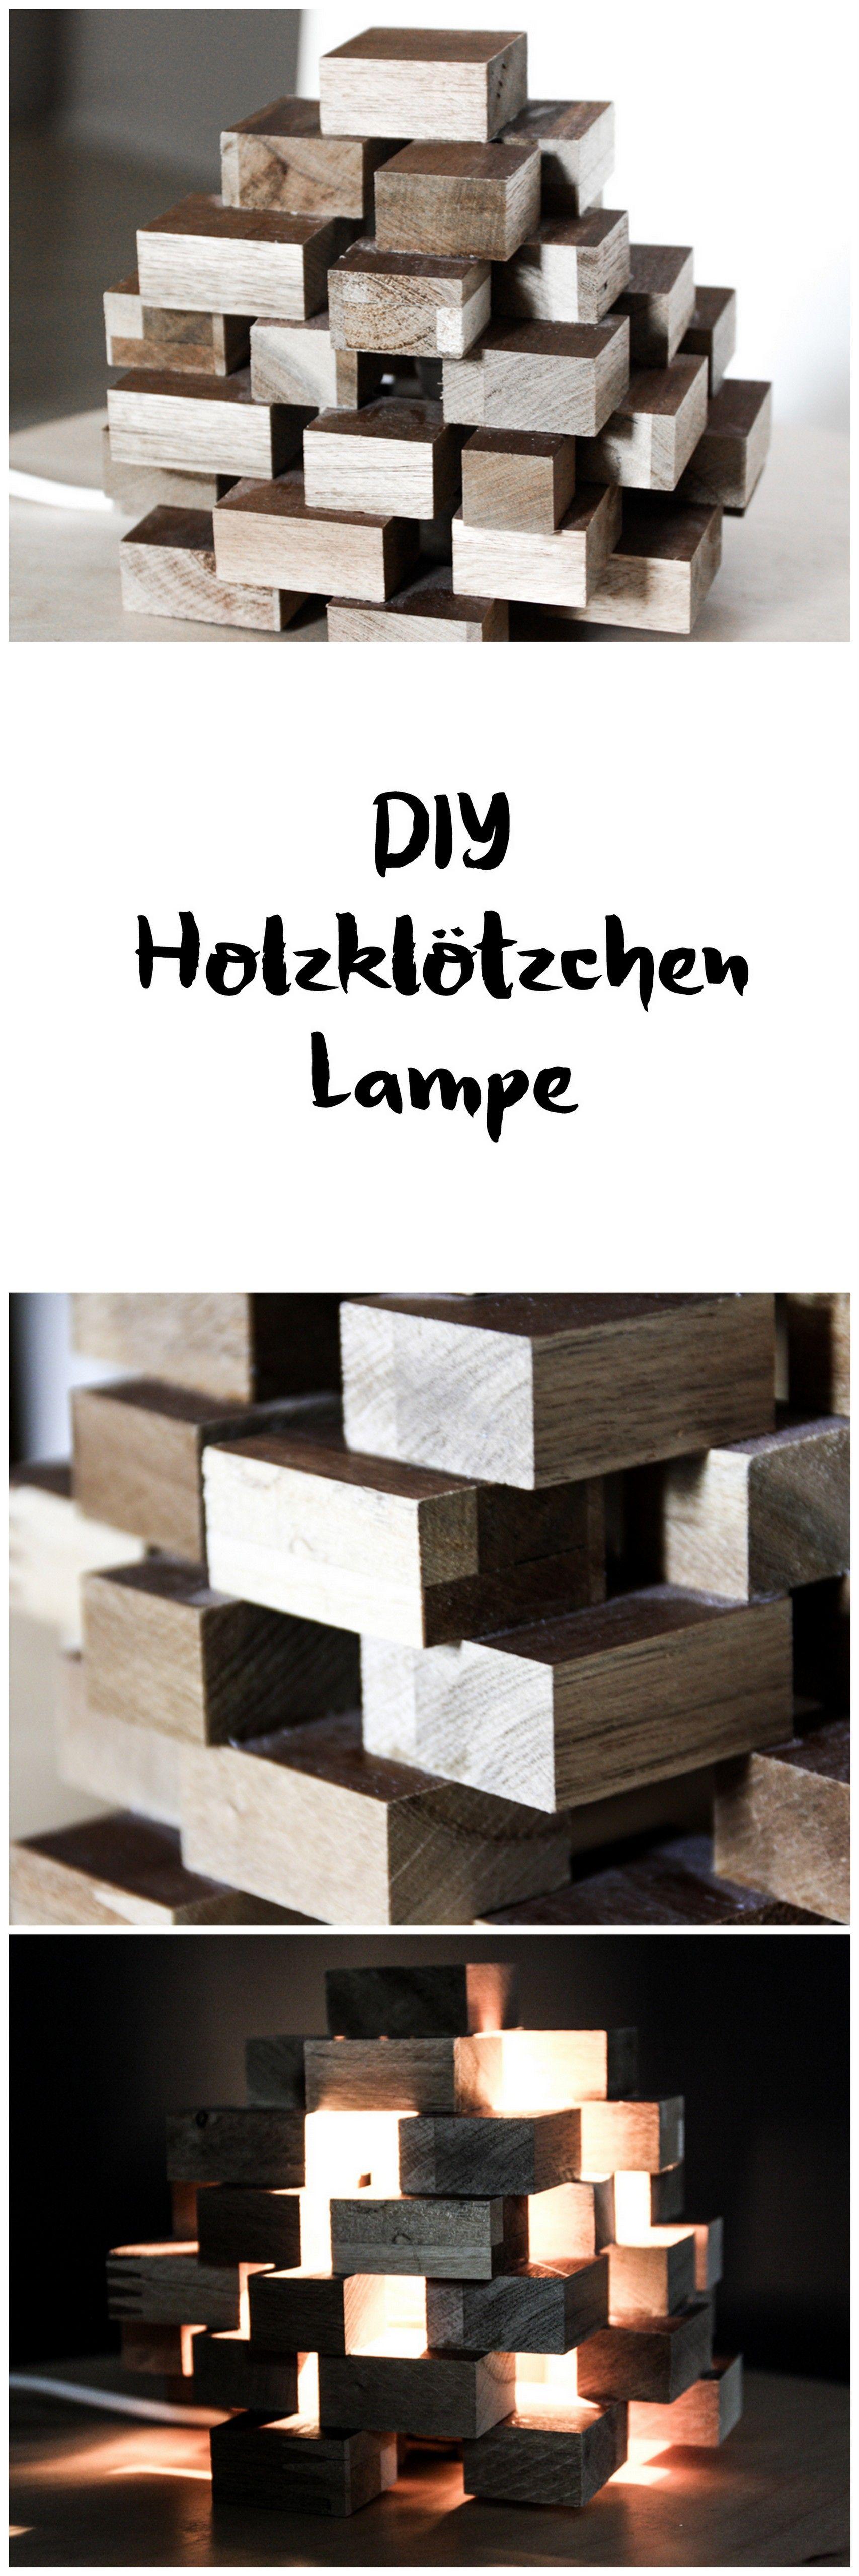 Diy Klotzchen Lampe Aus Holz Holzlampe Lampen Aus Holz Holzleuchte